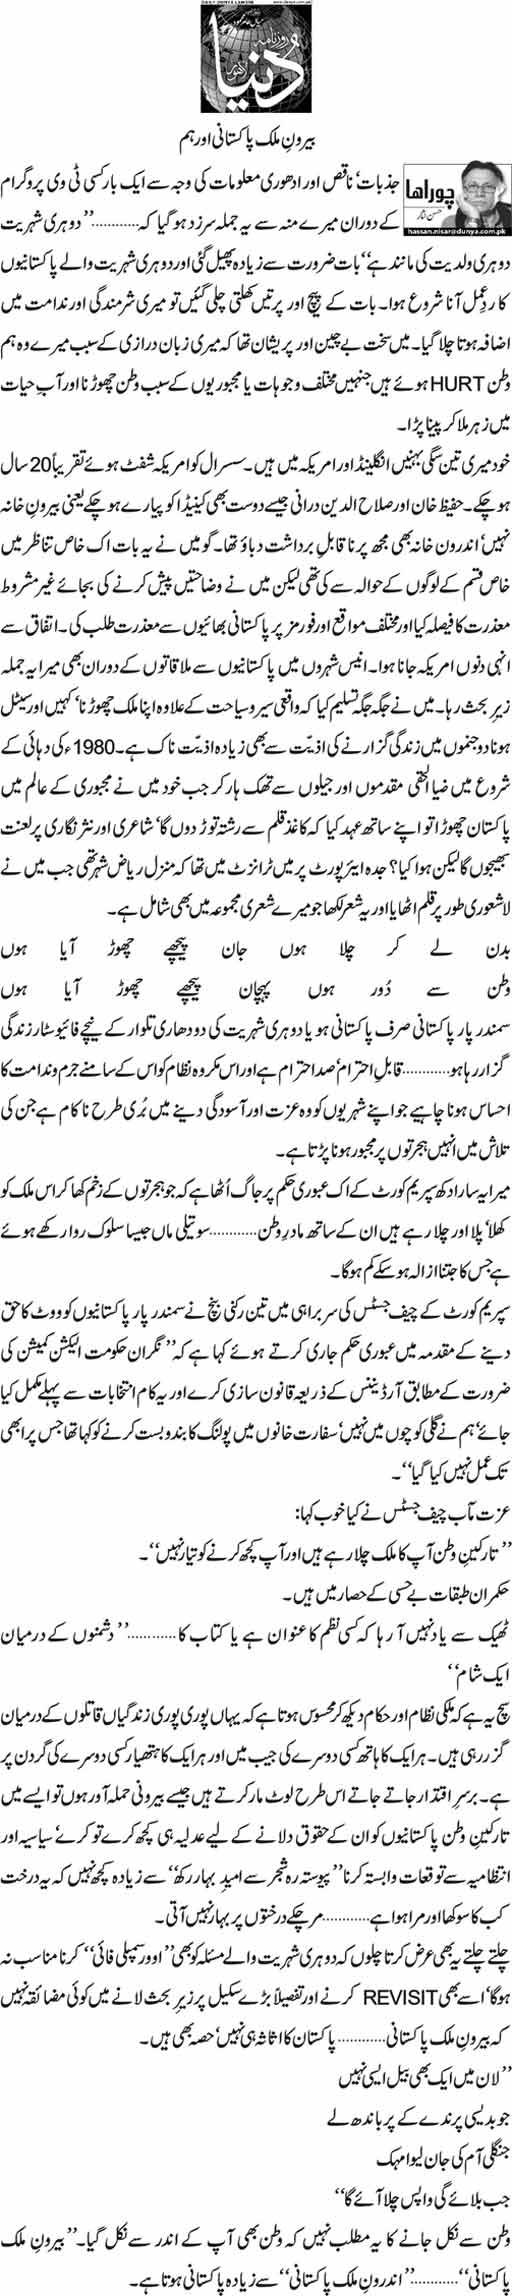 Biron e Mulk Pakistani Aur Hum - Hassan NisarBiron e Mulk Pakistani Aur Hum - Hassan Nisar